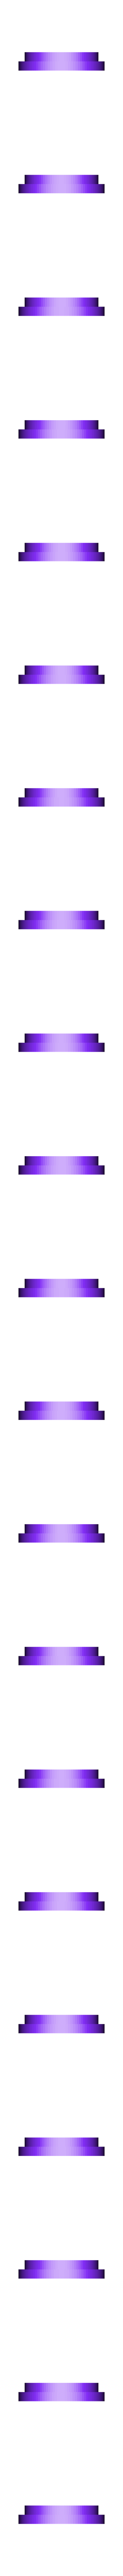 Underside_Ring.stl Télécharger fichier STL gratuit Aegis-fang- Wulfgar's Hammer (Imprimable) • Objet imprimable en 3D, derailed